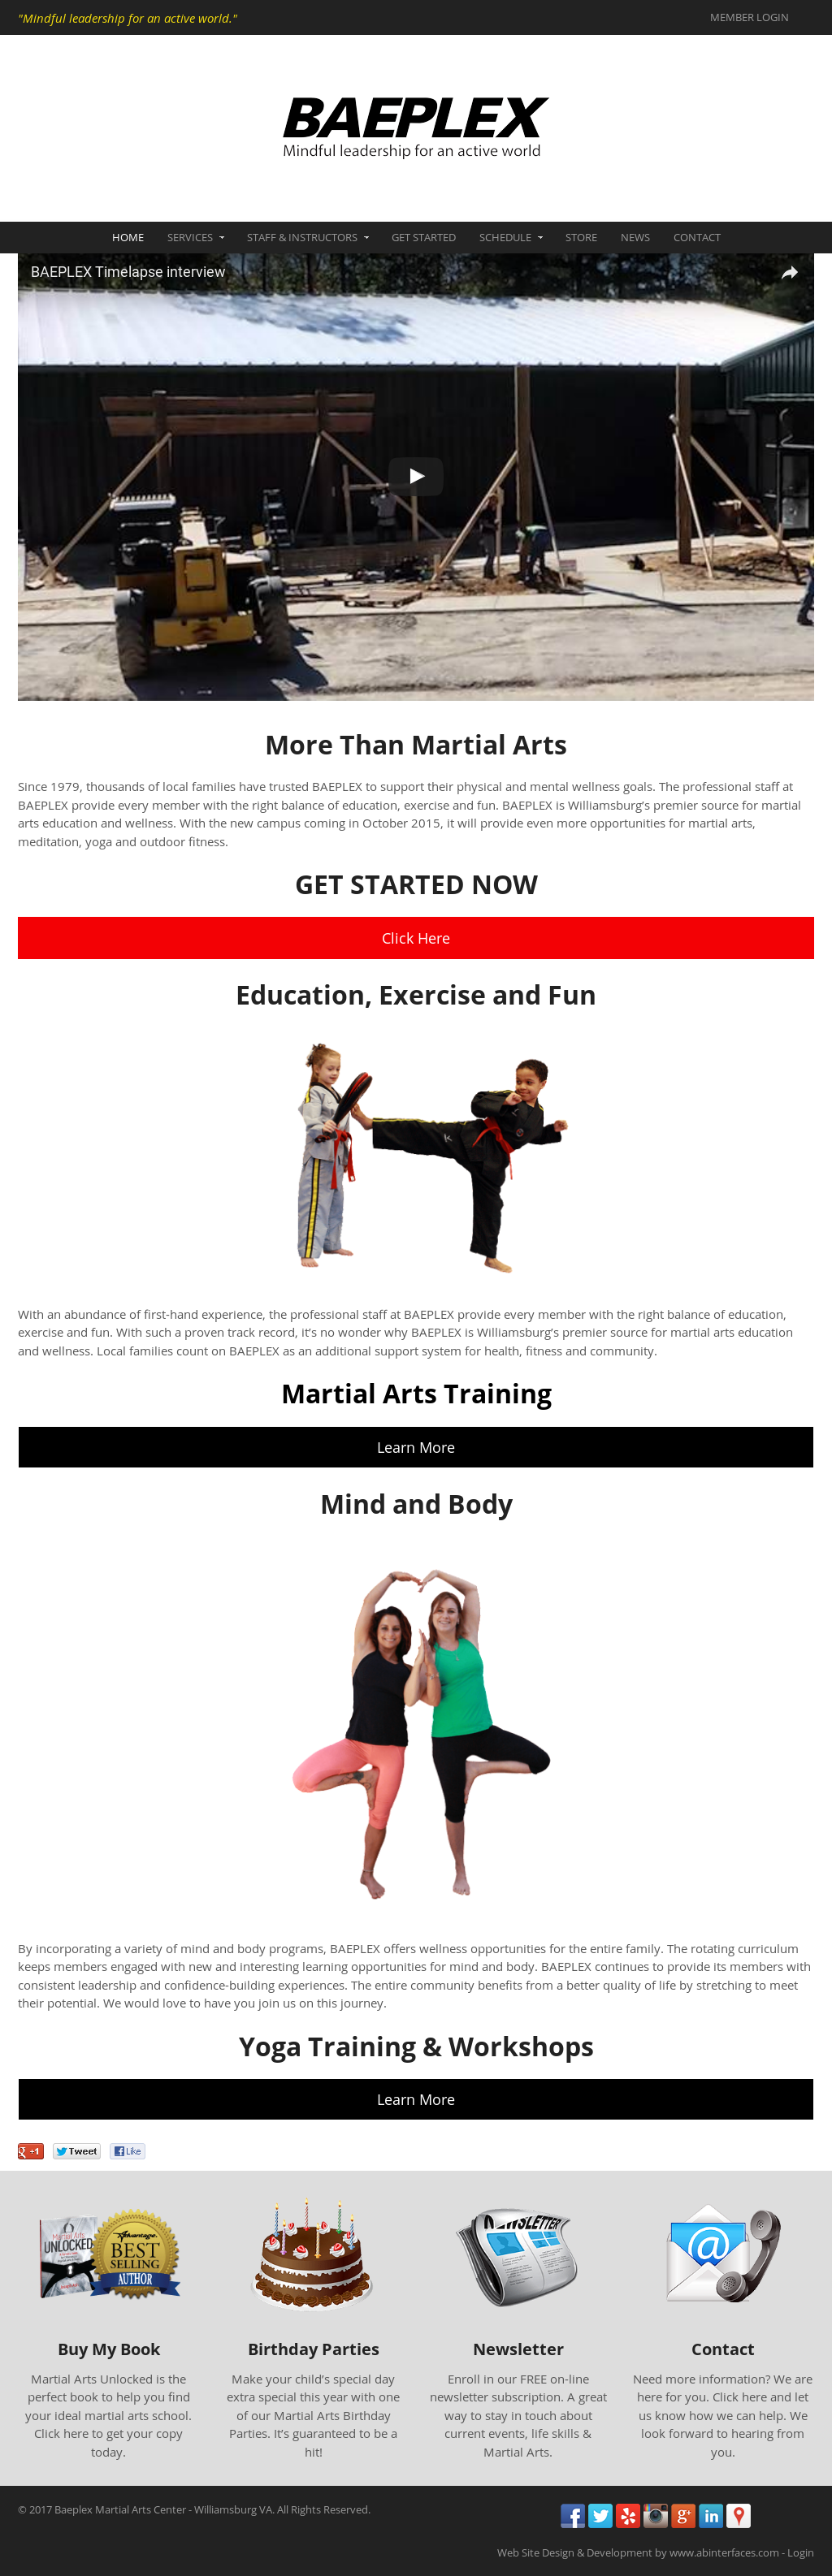 arts fitness quality of life program